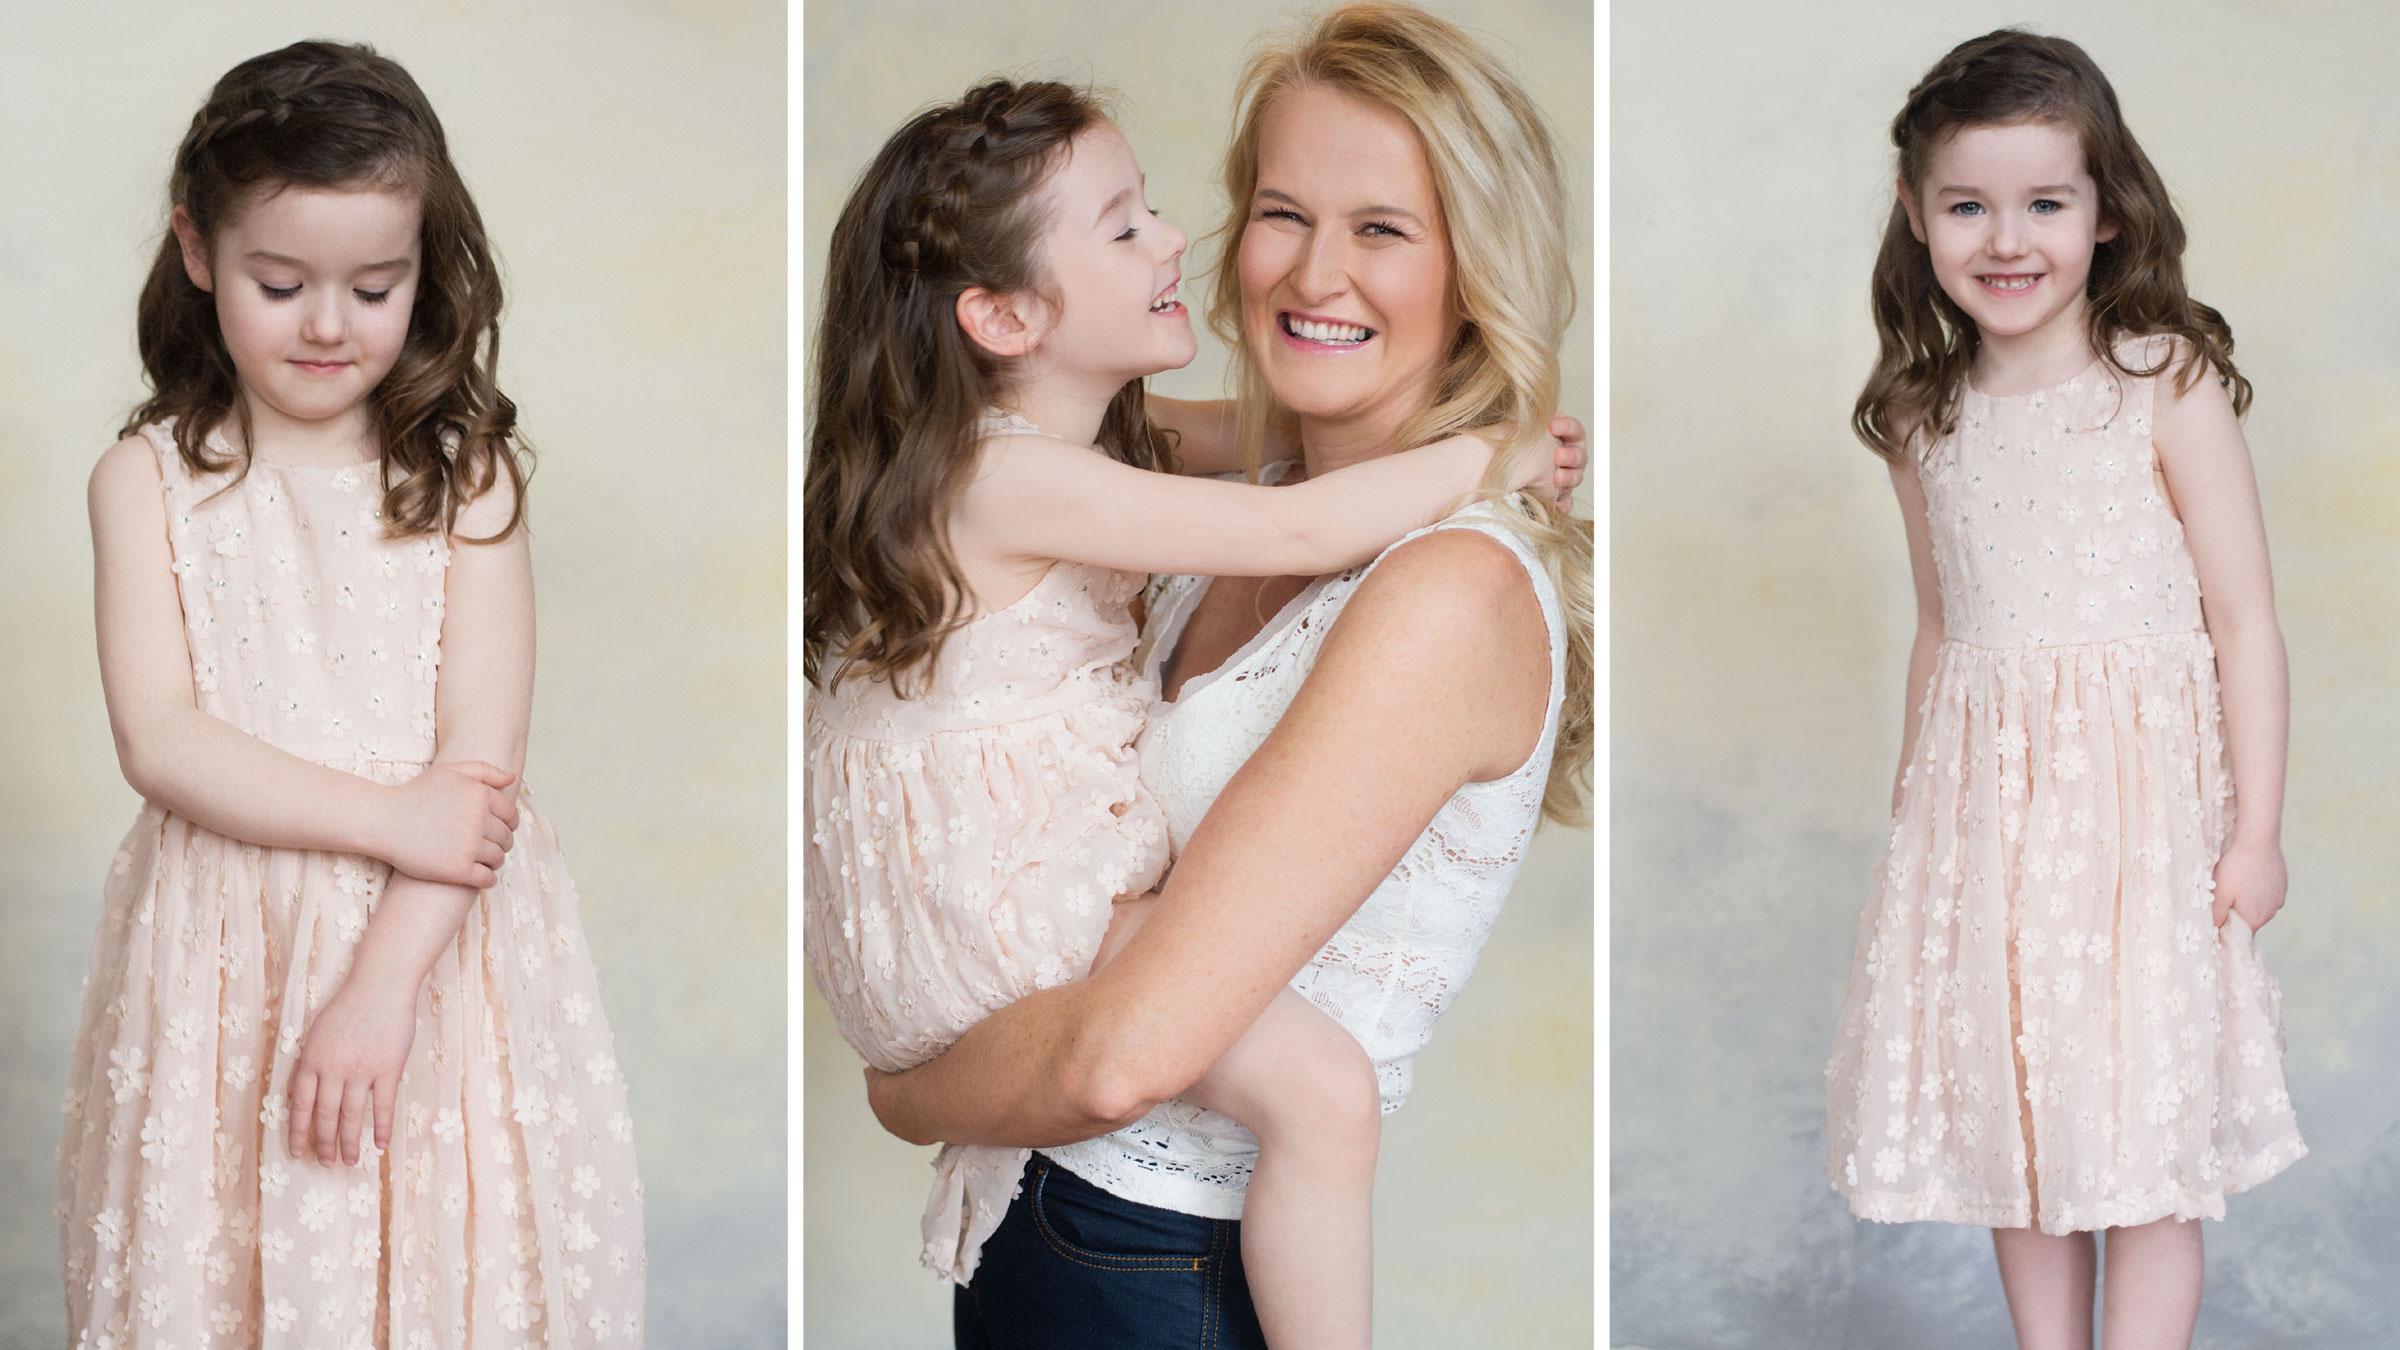 charlotte-kensington-portraits-ultimate-makeover-4.jpg